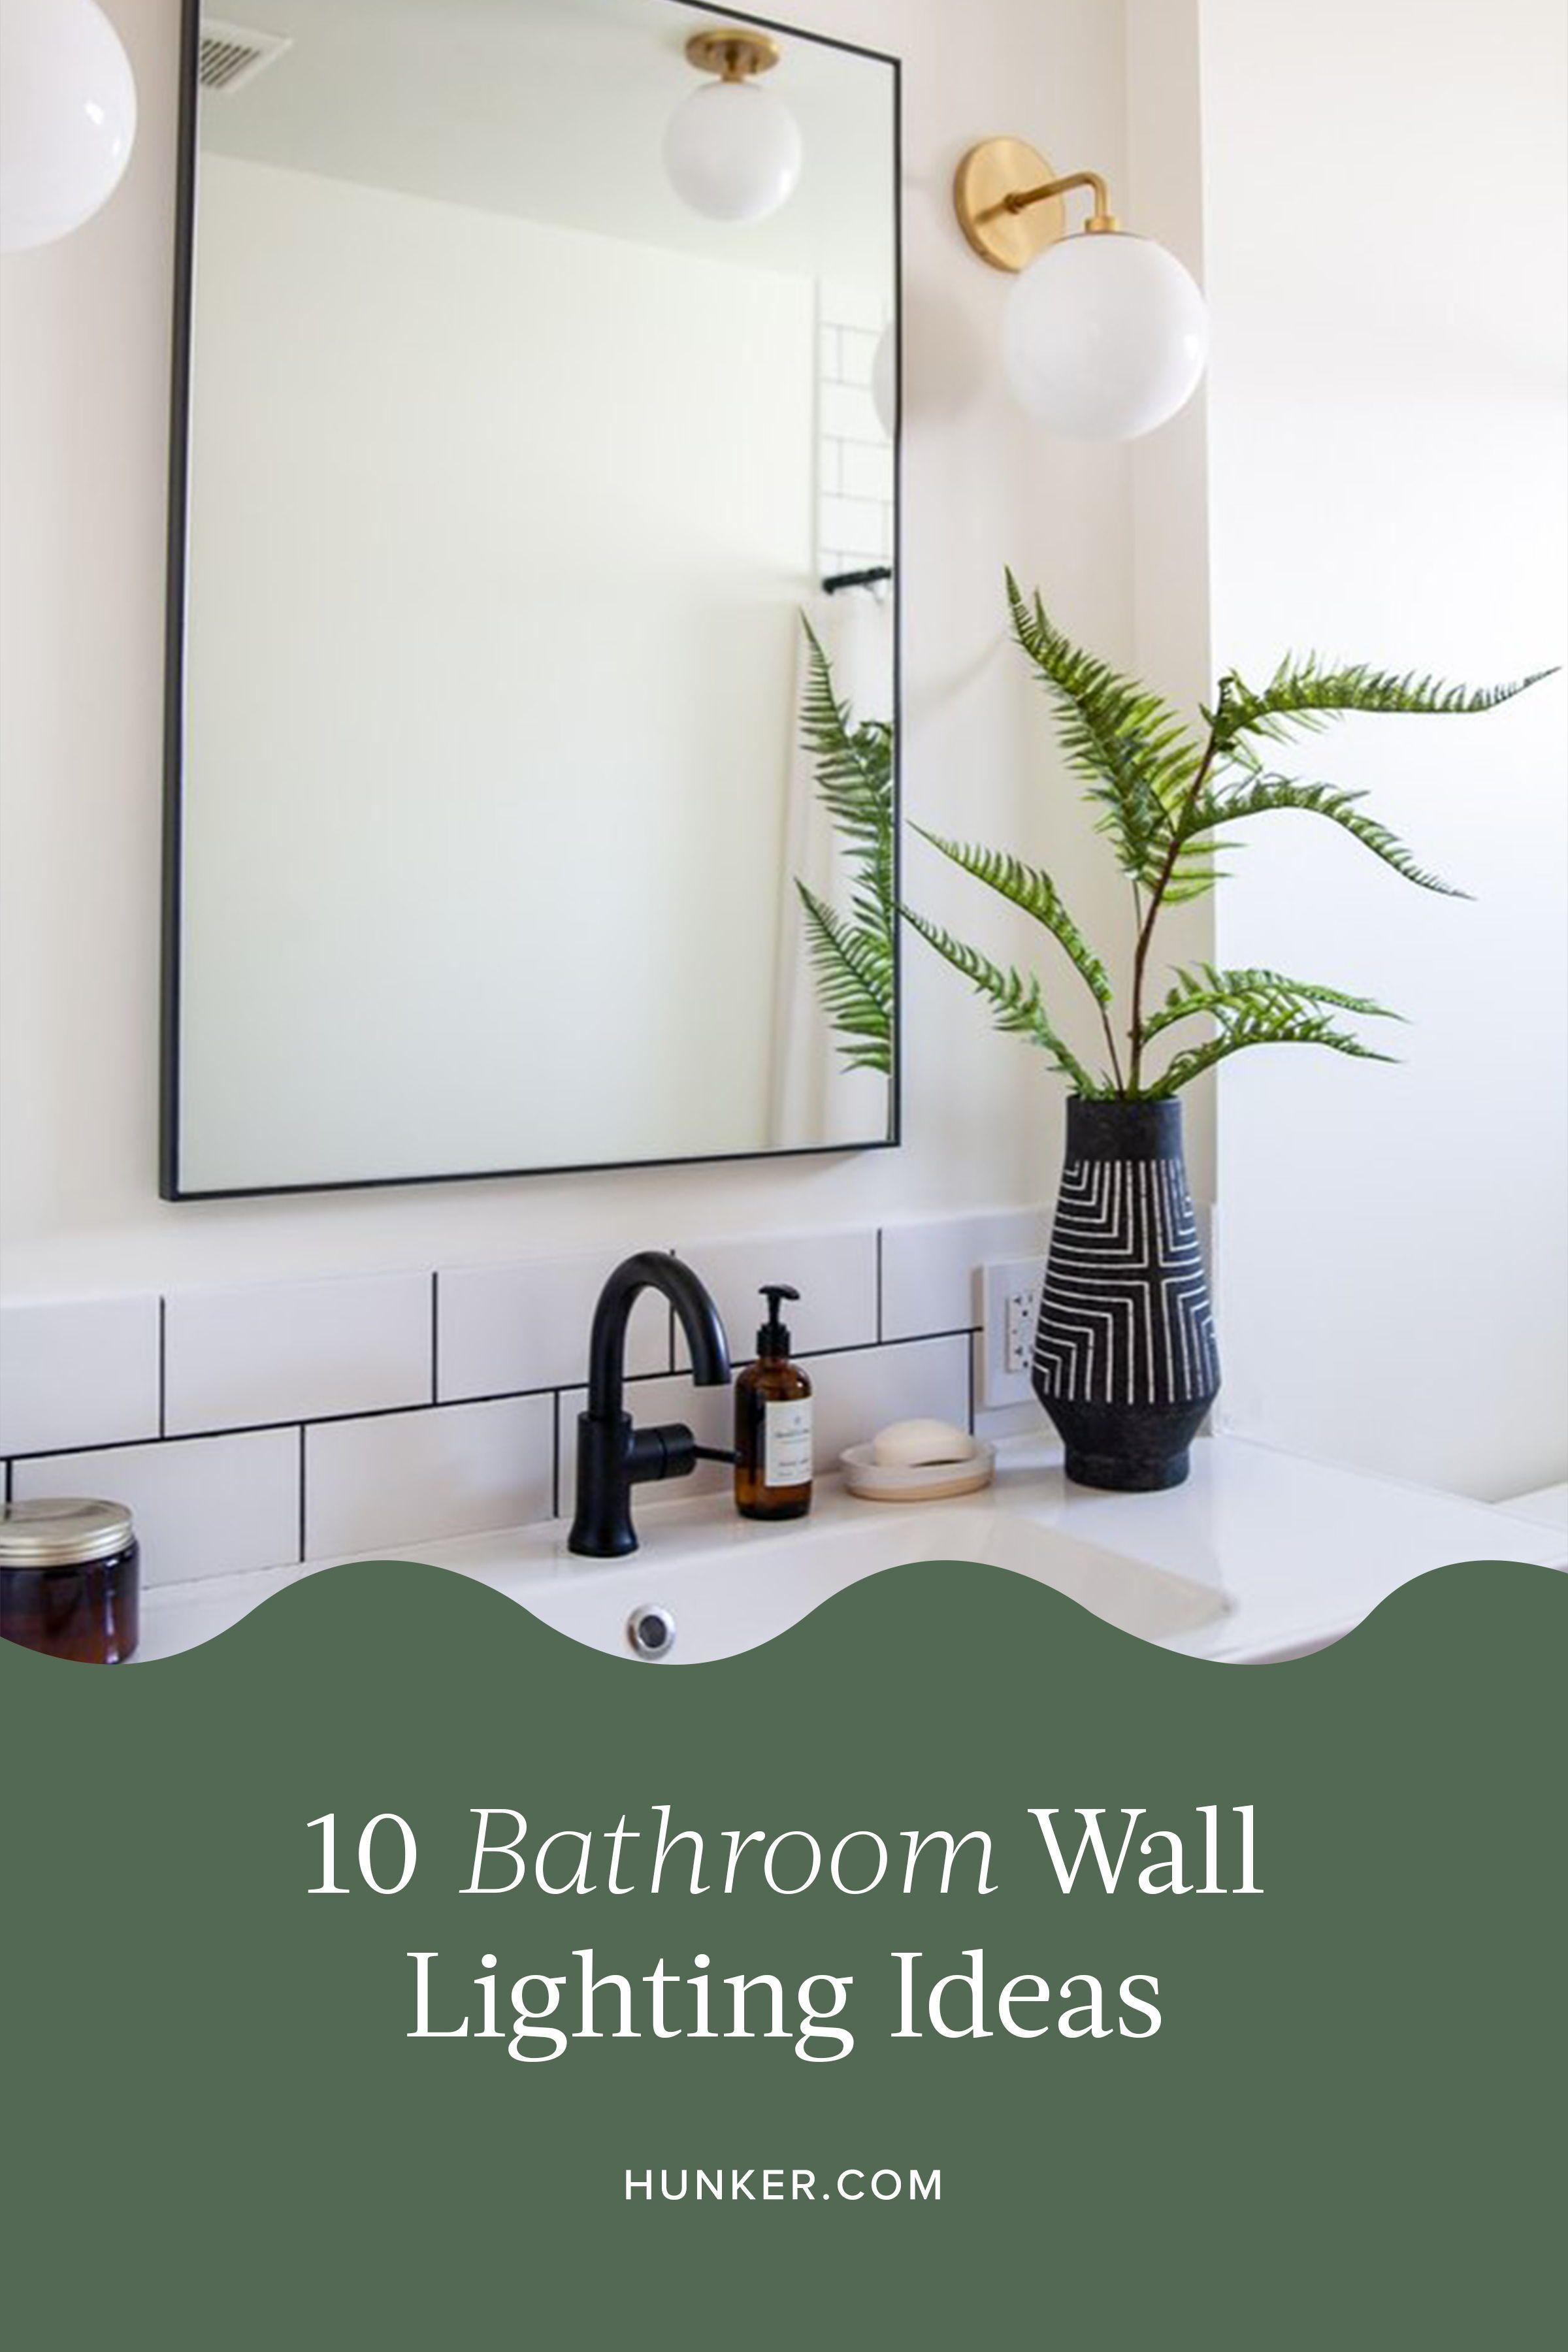 10 bathroom wall lighting ideas that